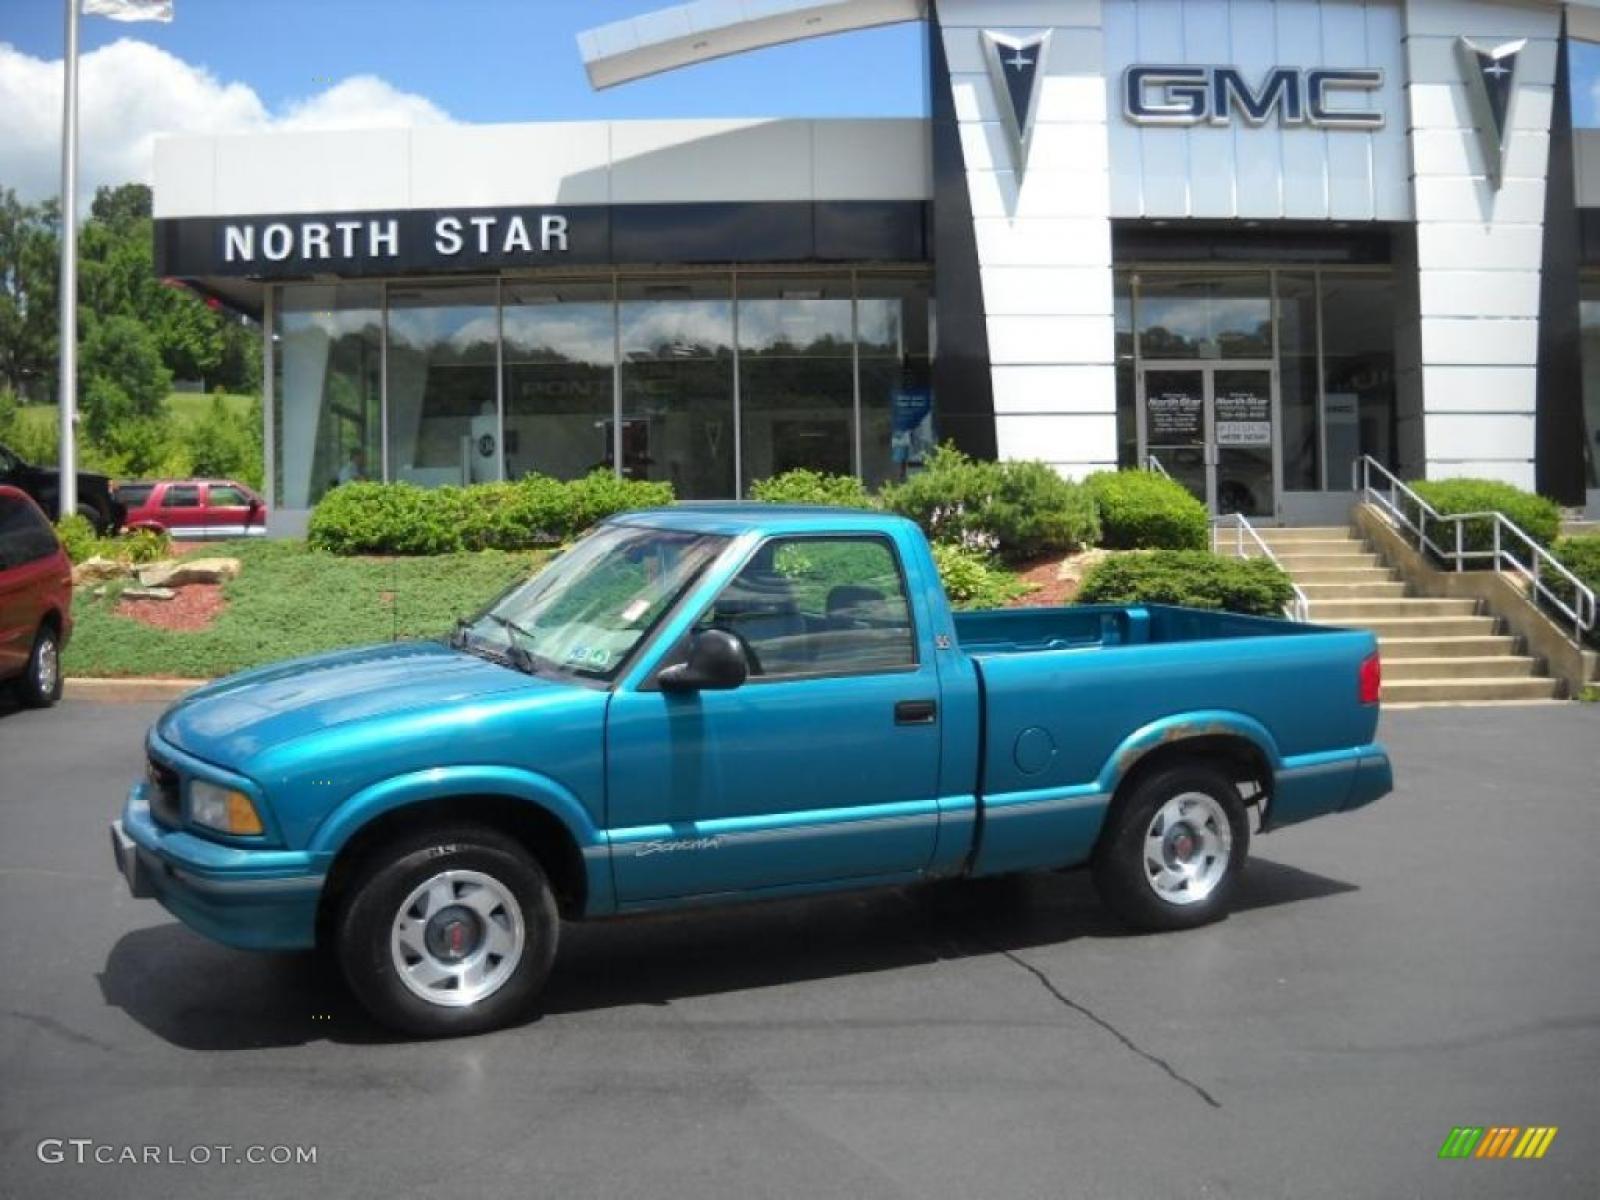 800 1024 1280 1600 origin 1995 GMC Sonoma ...